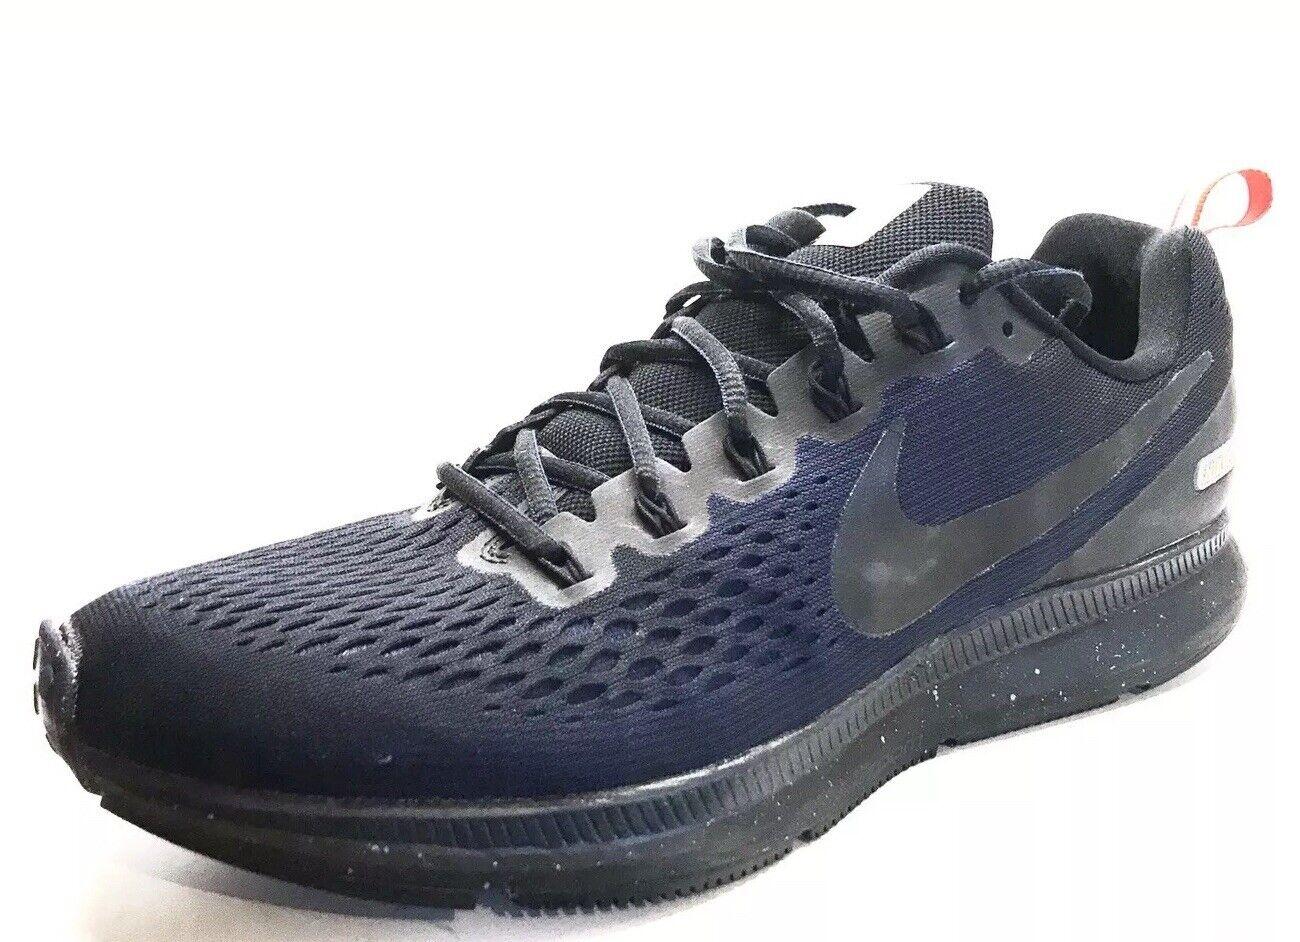 Sz. 11.5 NIKE Air Zoom PEGASUS 34 Shield EXCELLENT Black Obsidian Running shoes